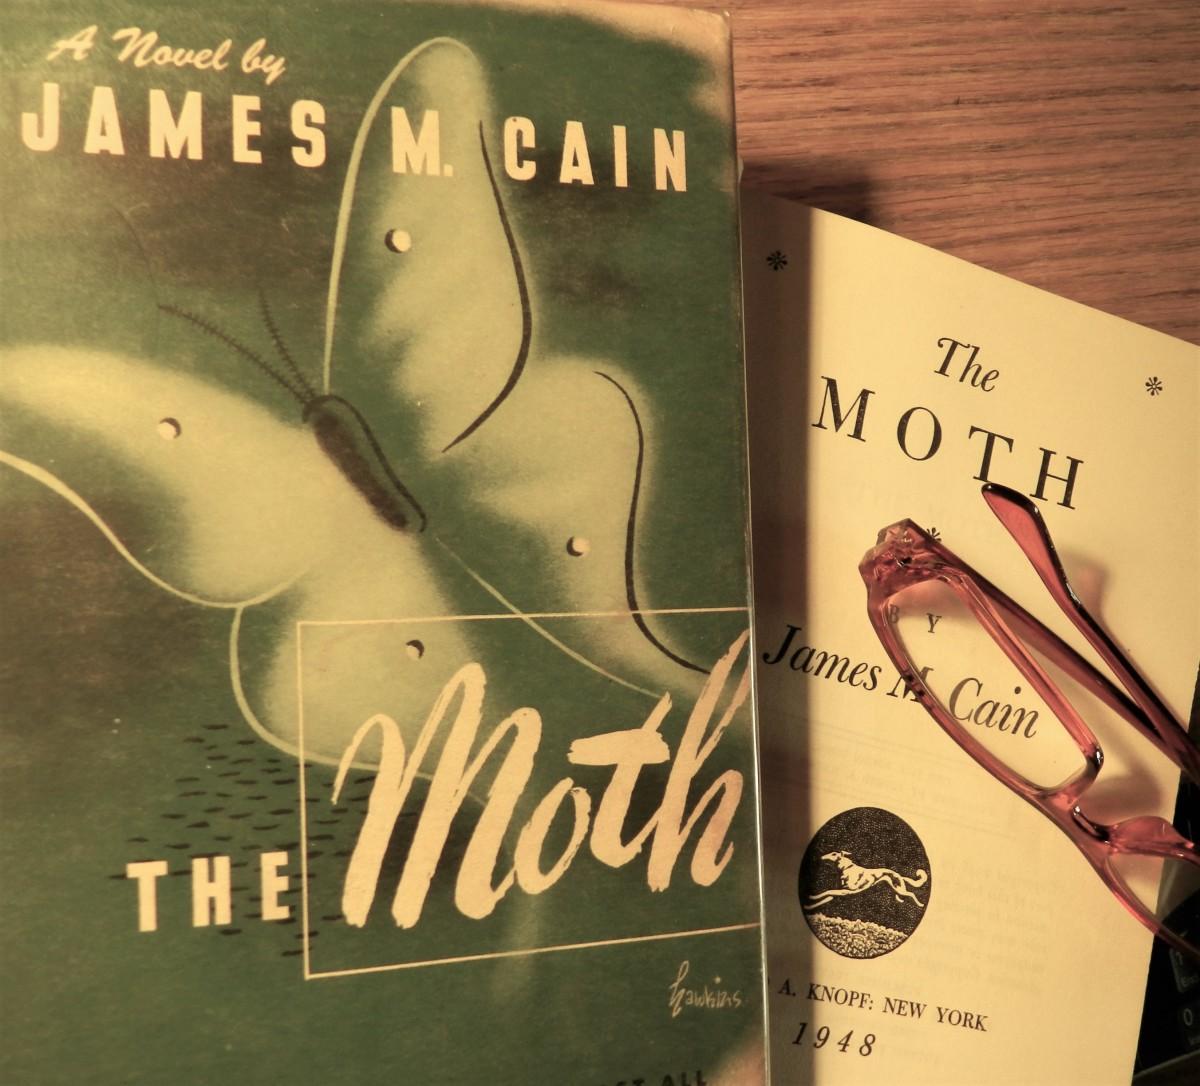 James M. Cain's Lesser Known Classic Novel